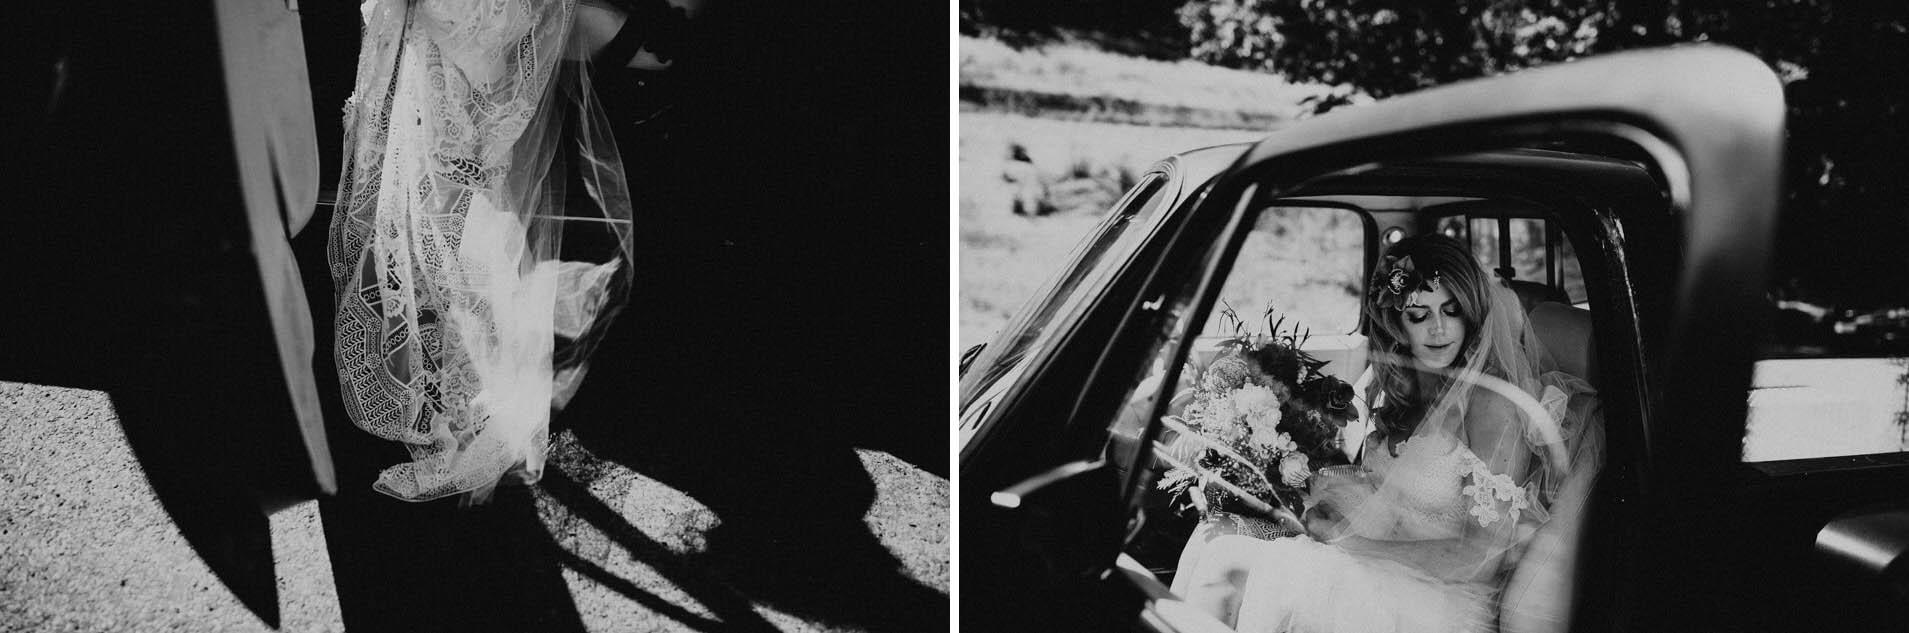 suger-pine-walk-wedding (Corinna & Dylan)_079(2182)2.jpg